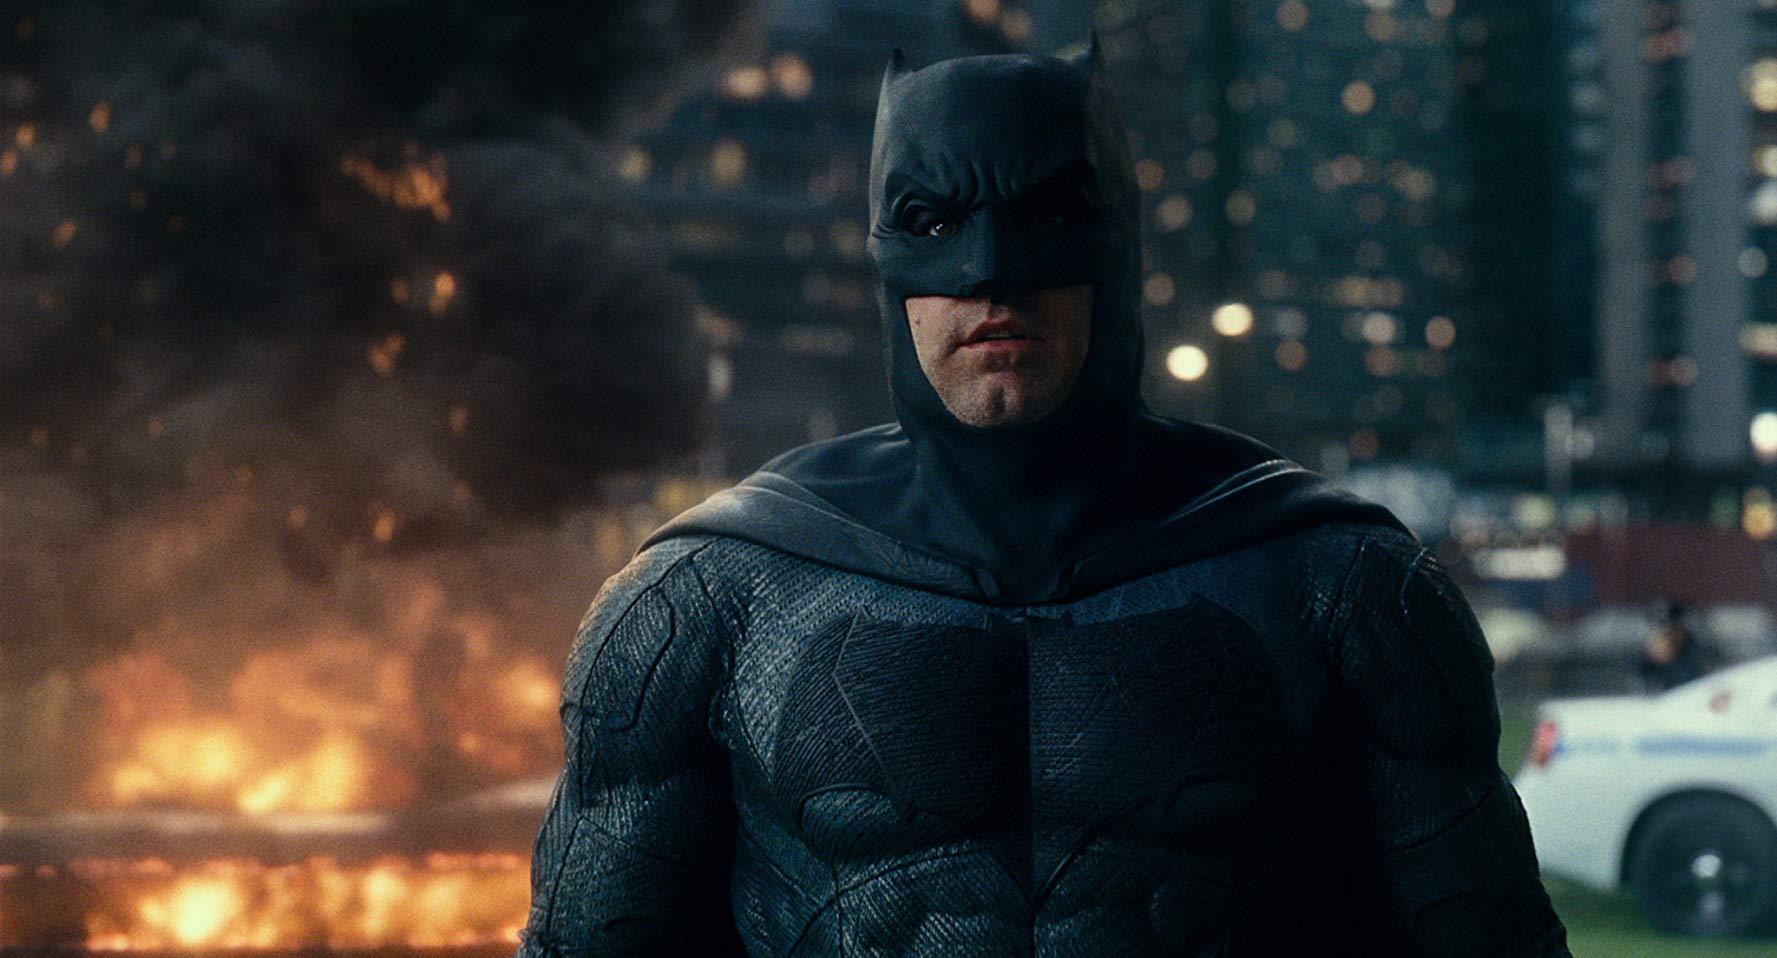 batmanjusticeleague.jpg